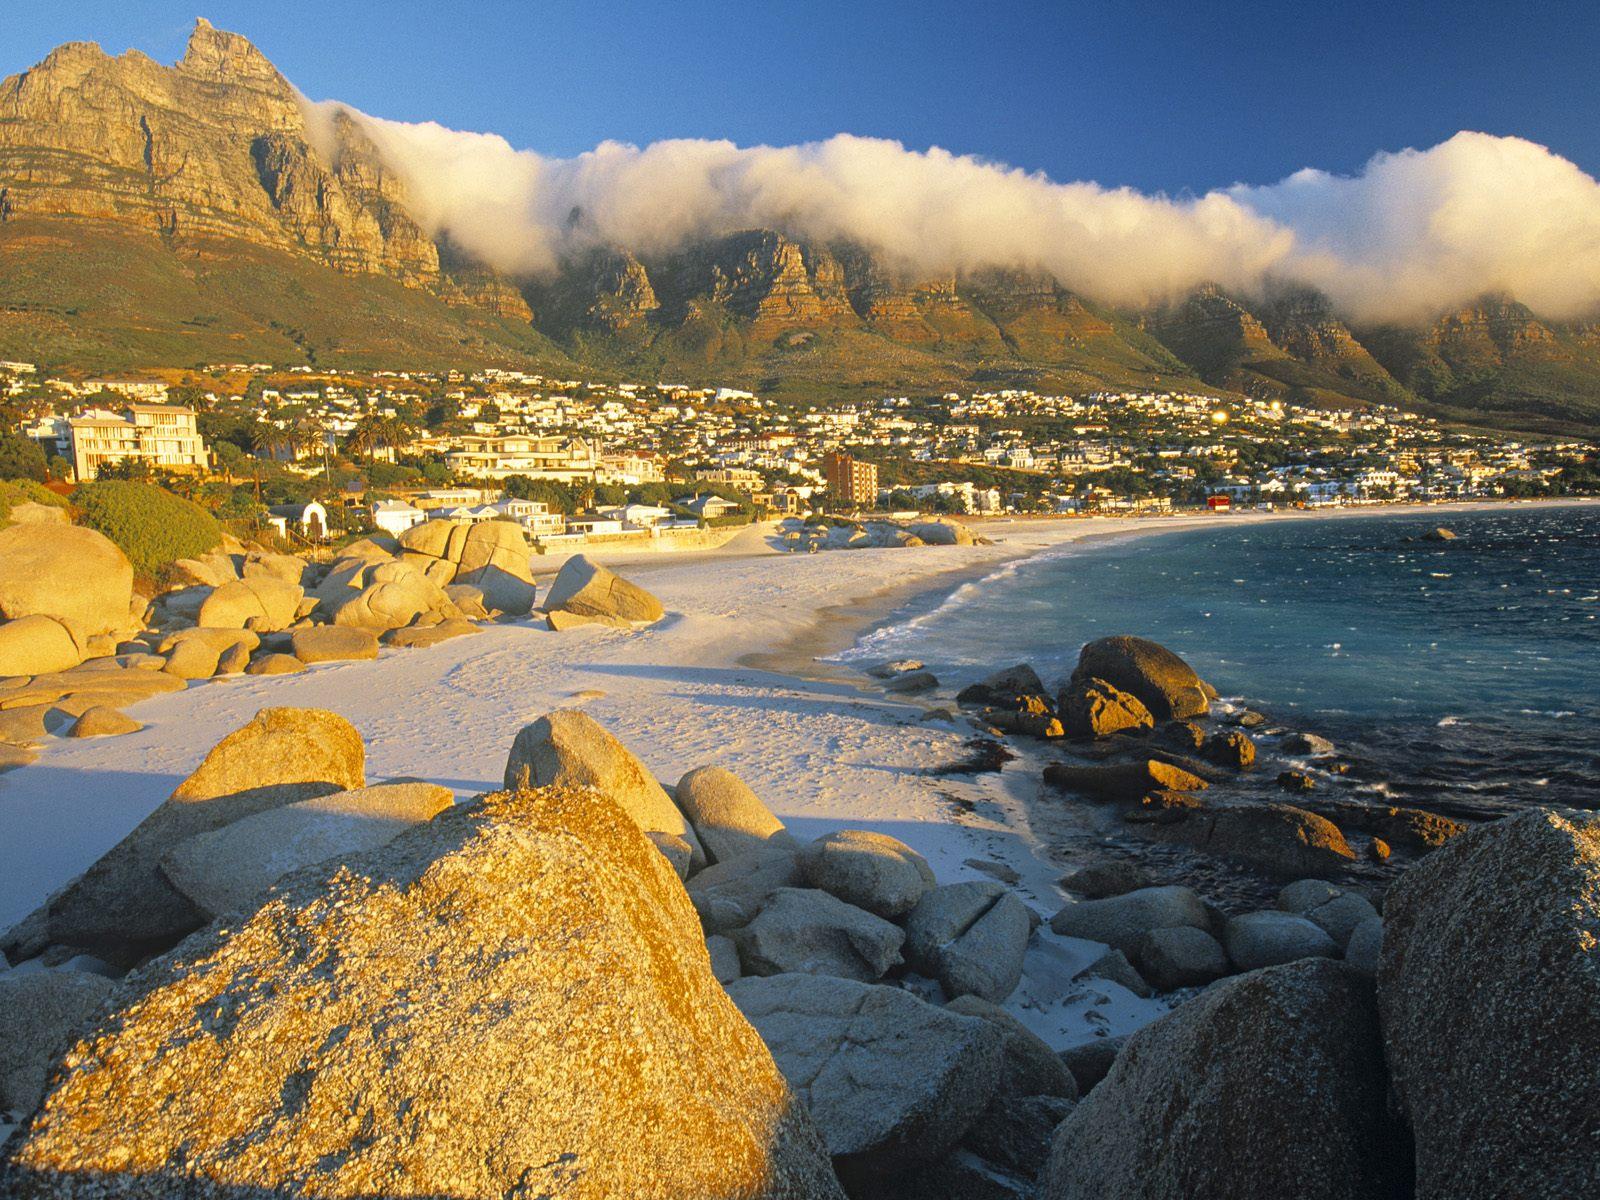 wallpaper south africa,nature,natural landscape,mountainous landforms,mountain,rock